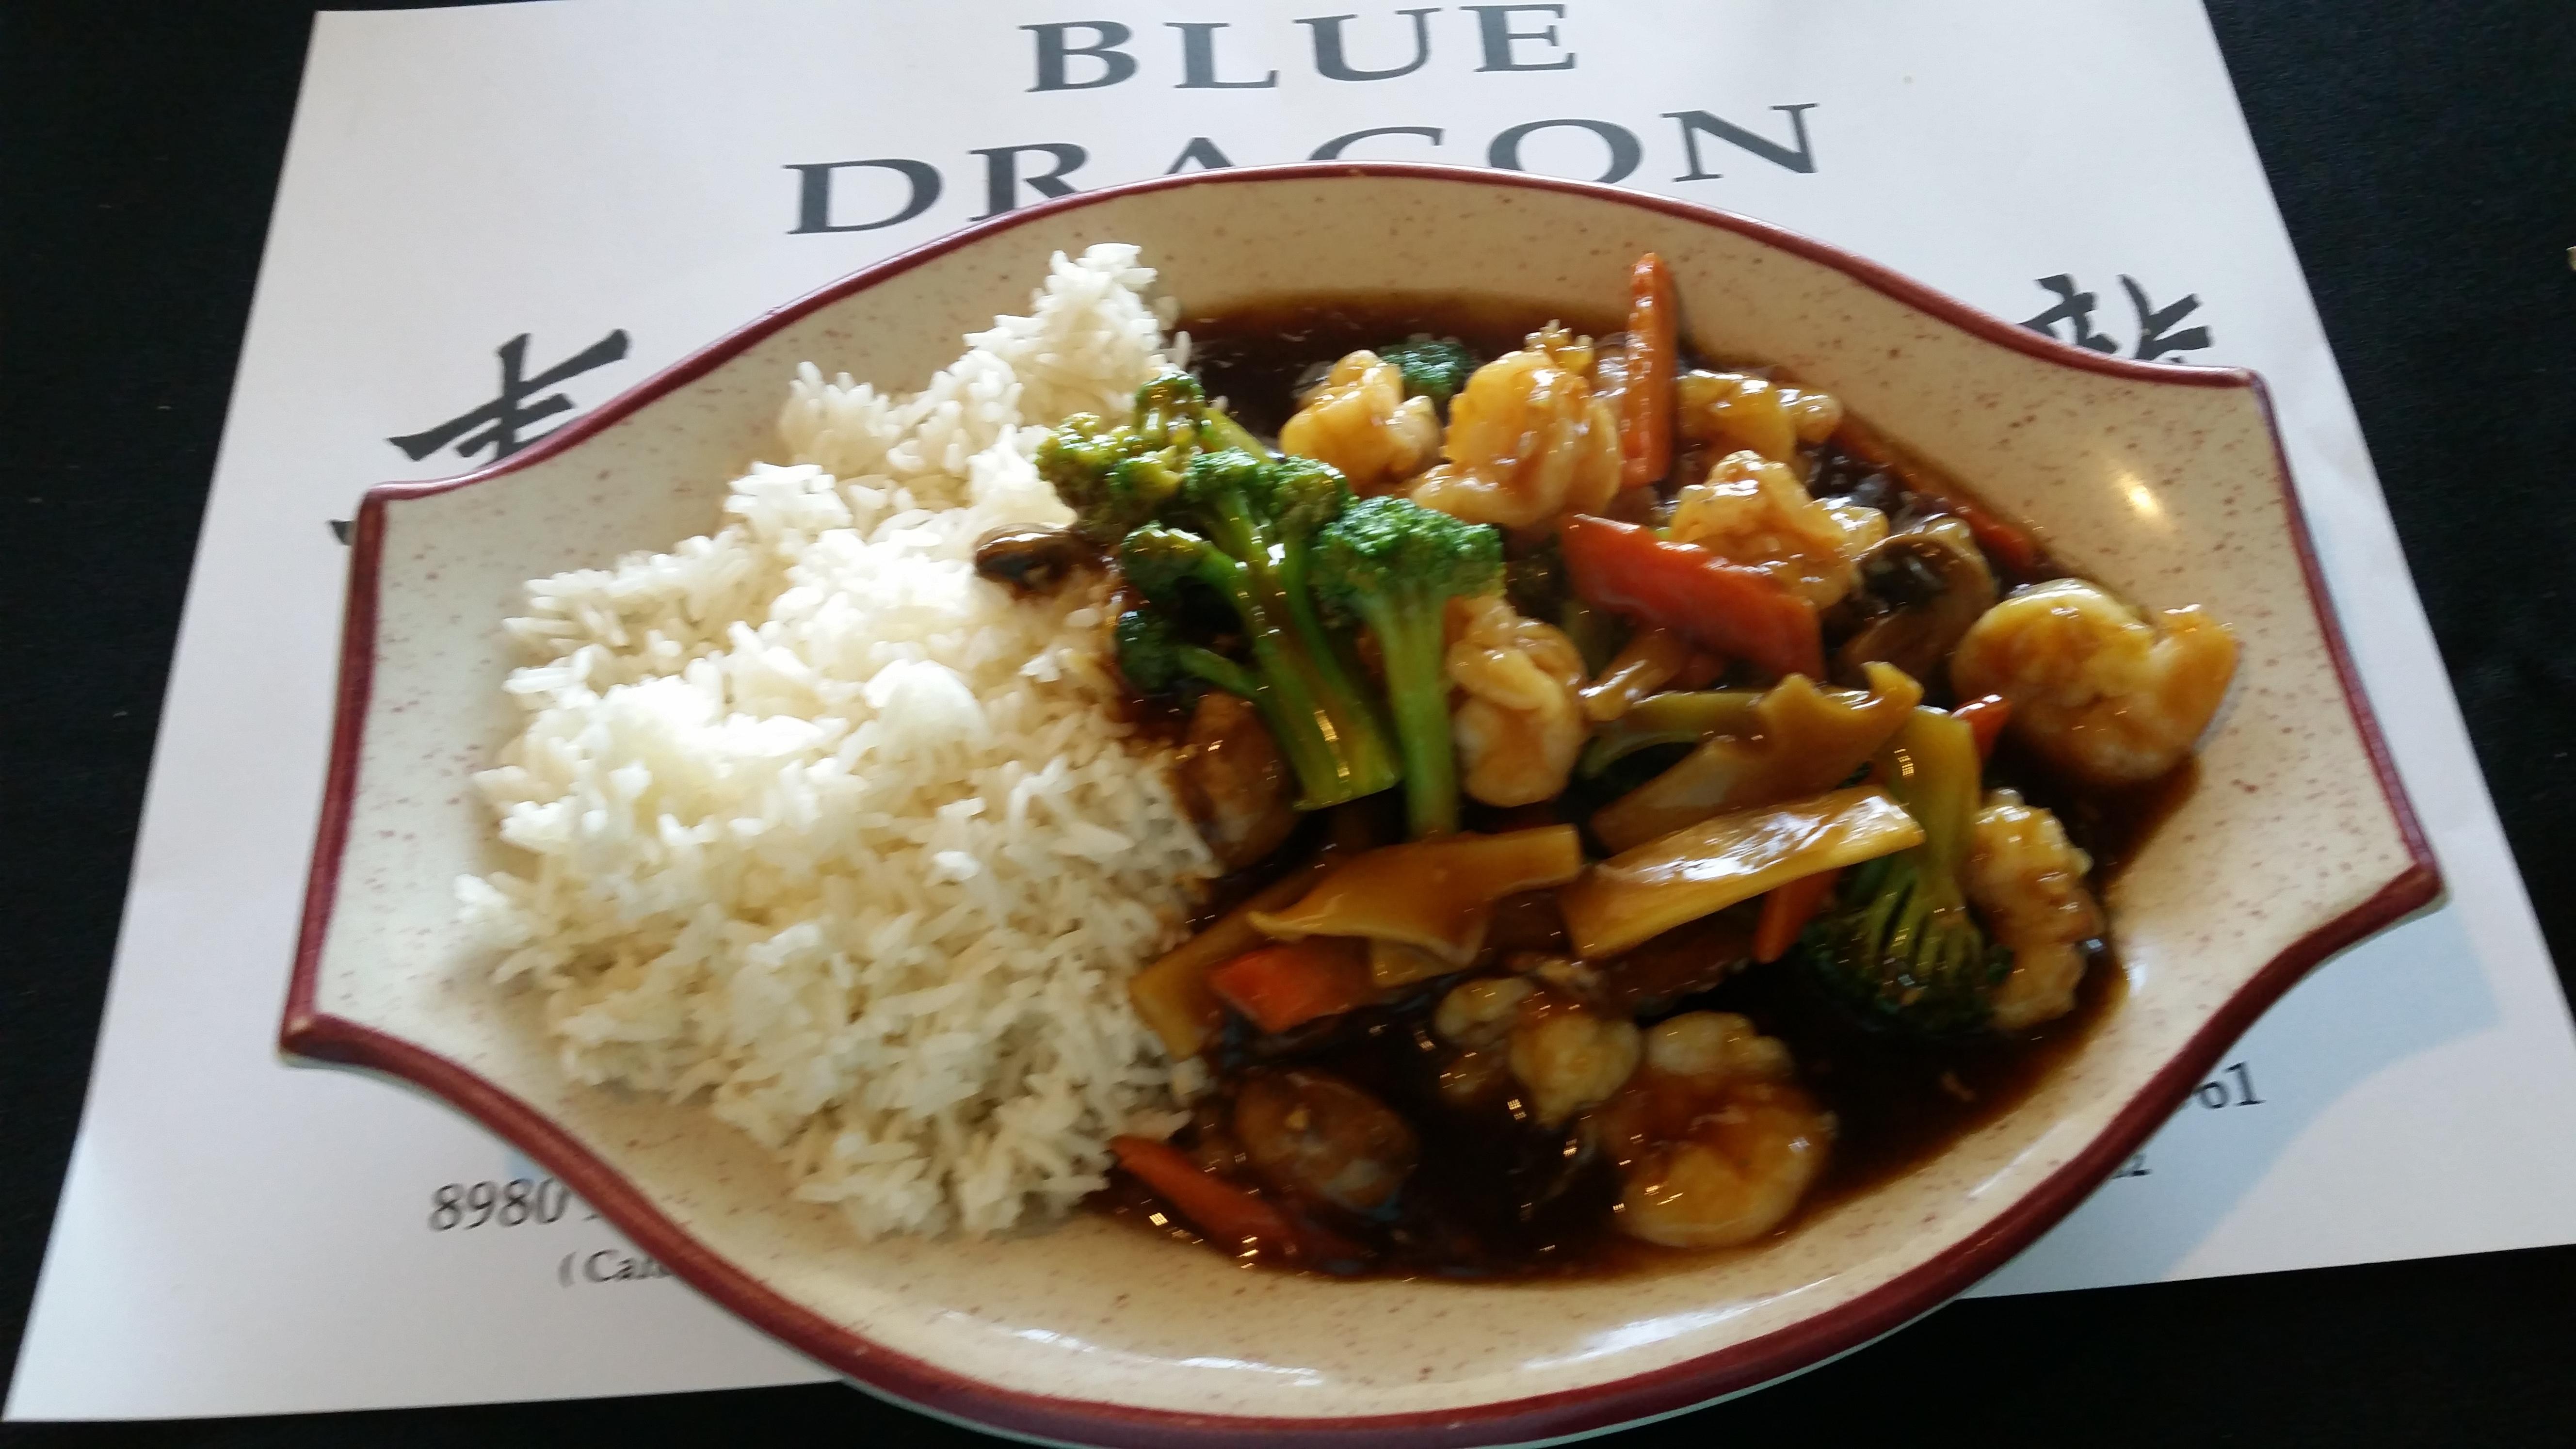 Dinner at Blue Dragon